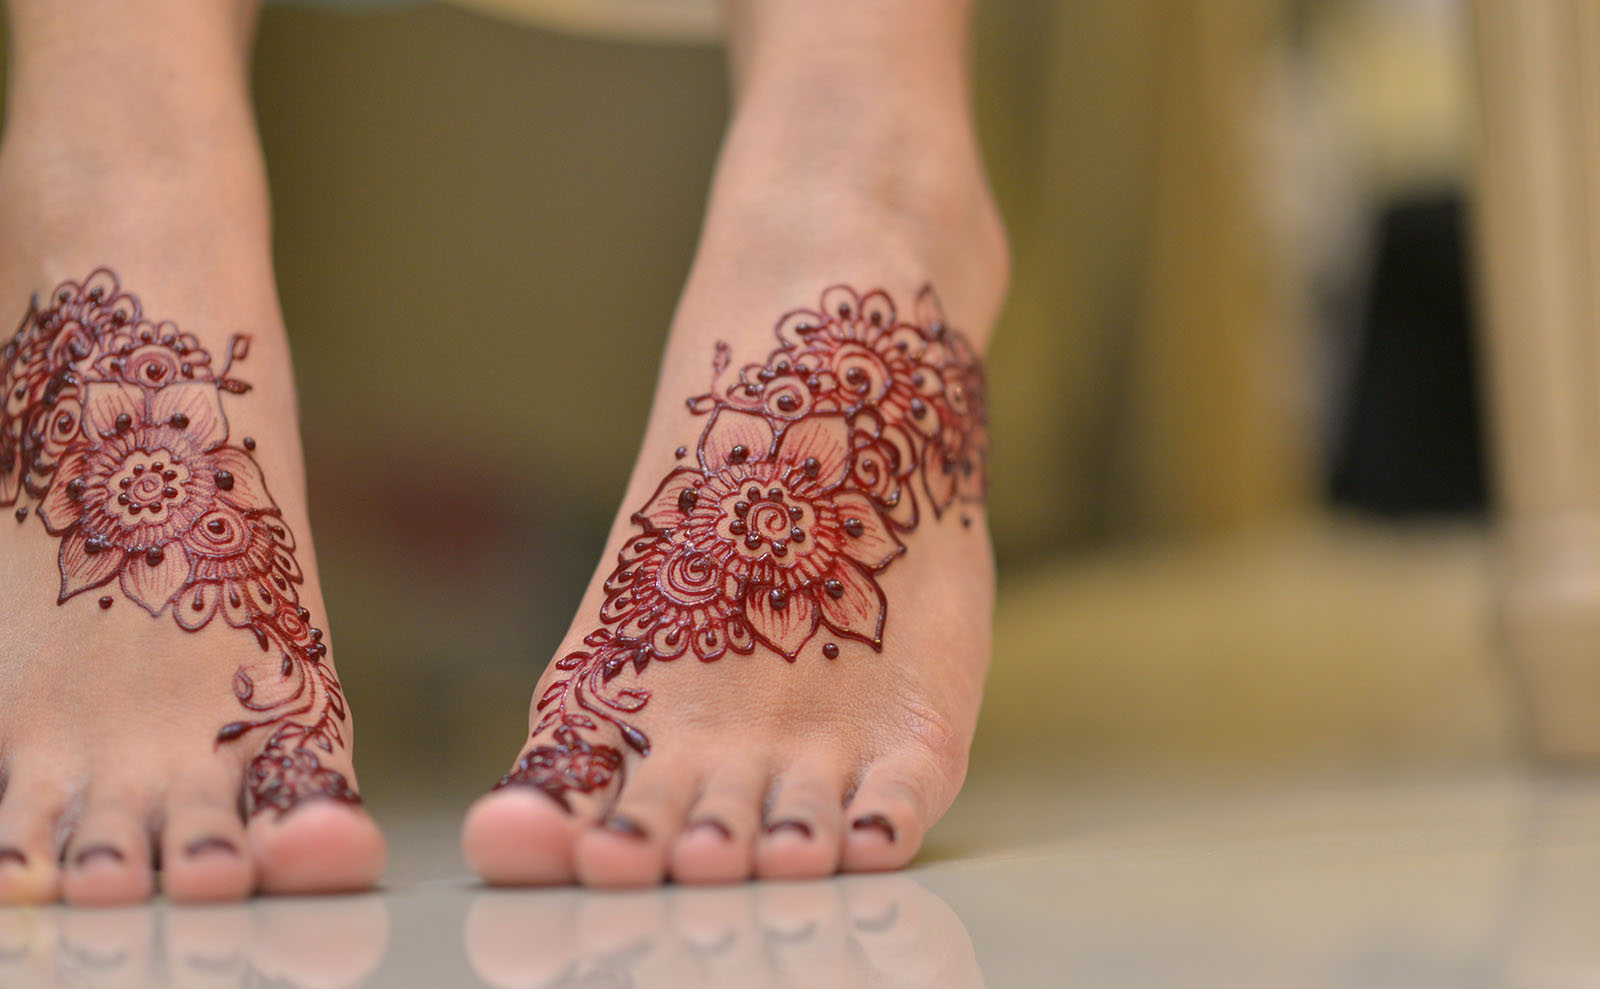 a woman's feet displaying black henna tattoos